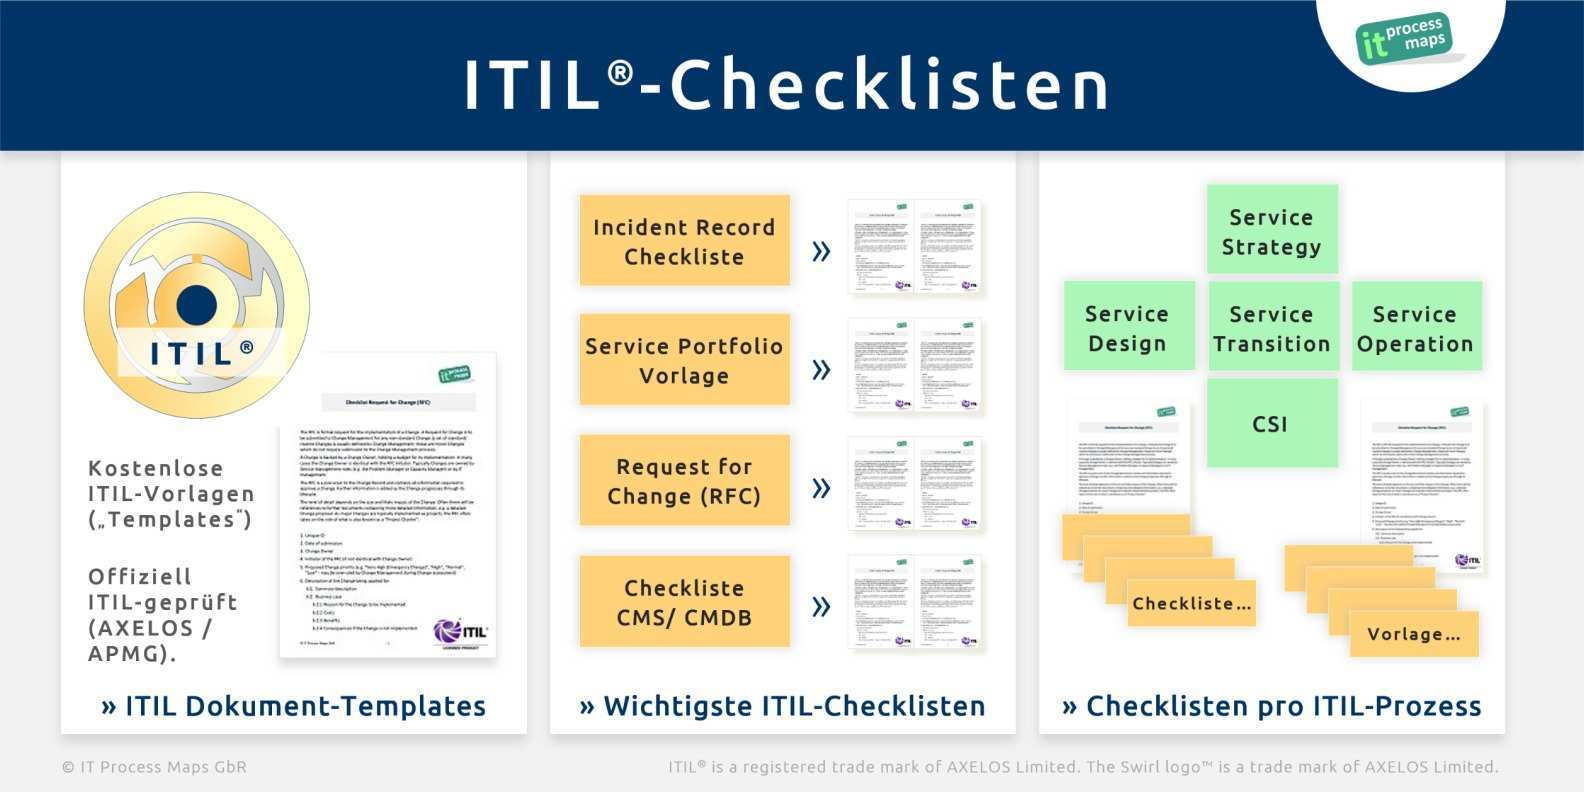 Itil Checklisten It Process Wiki